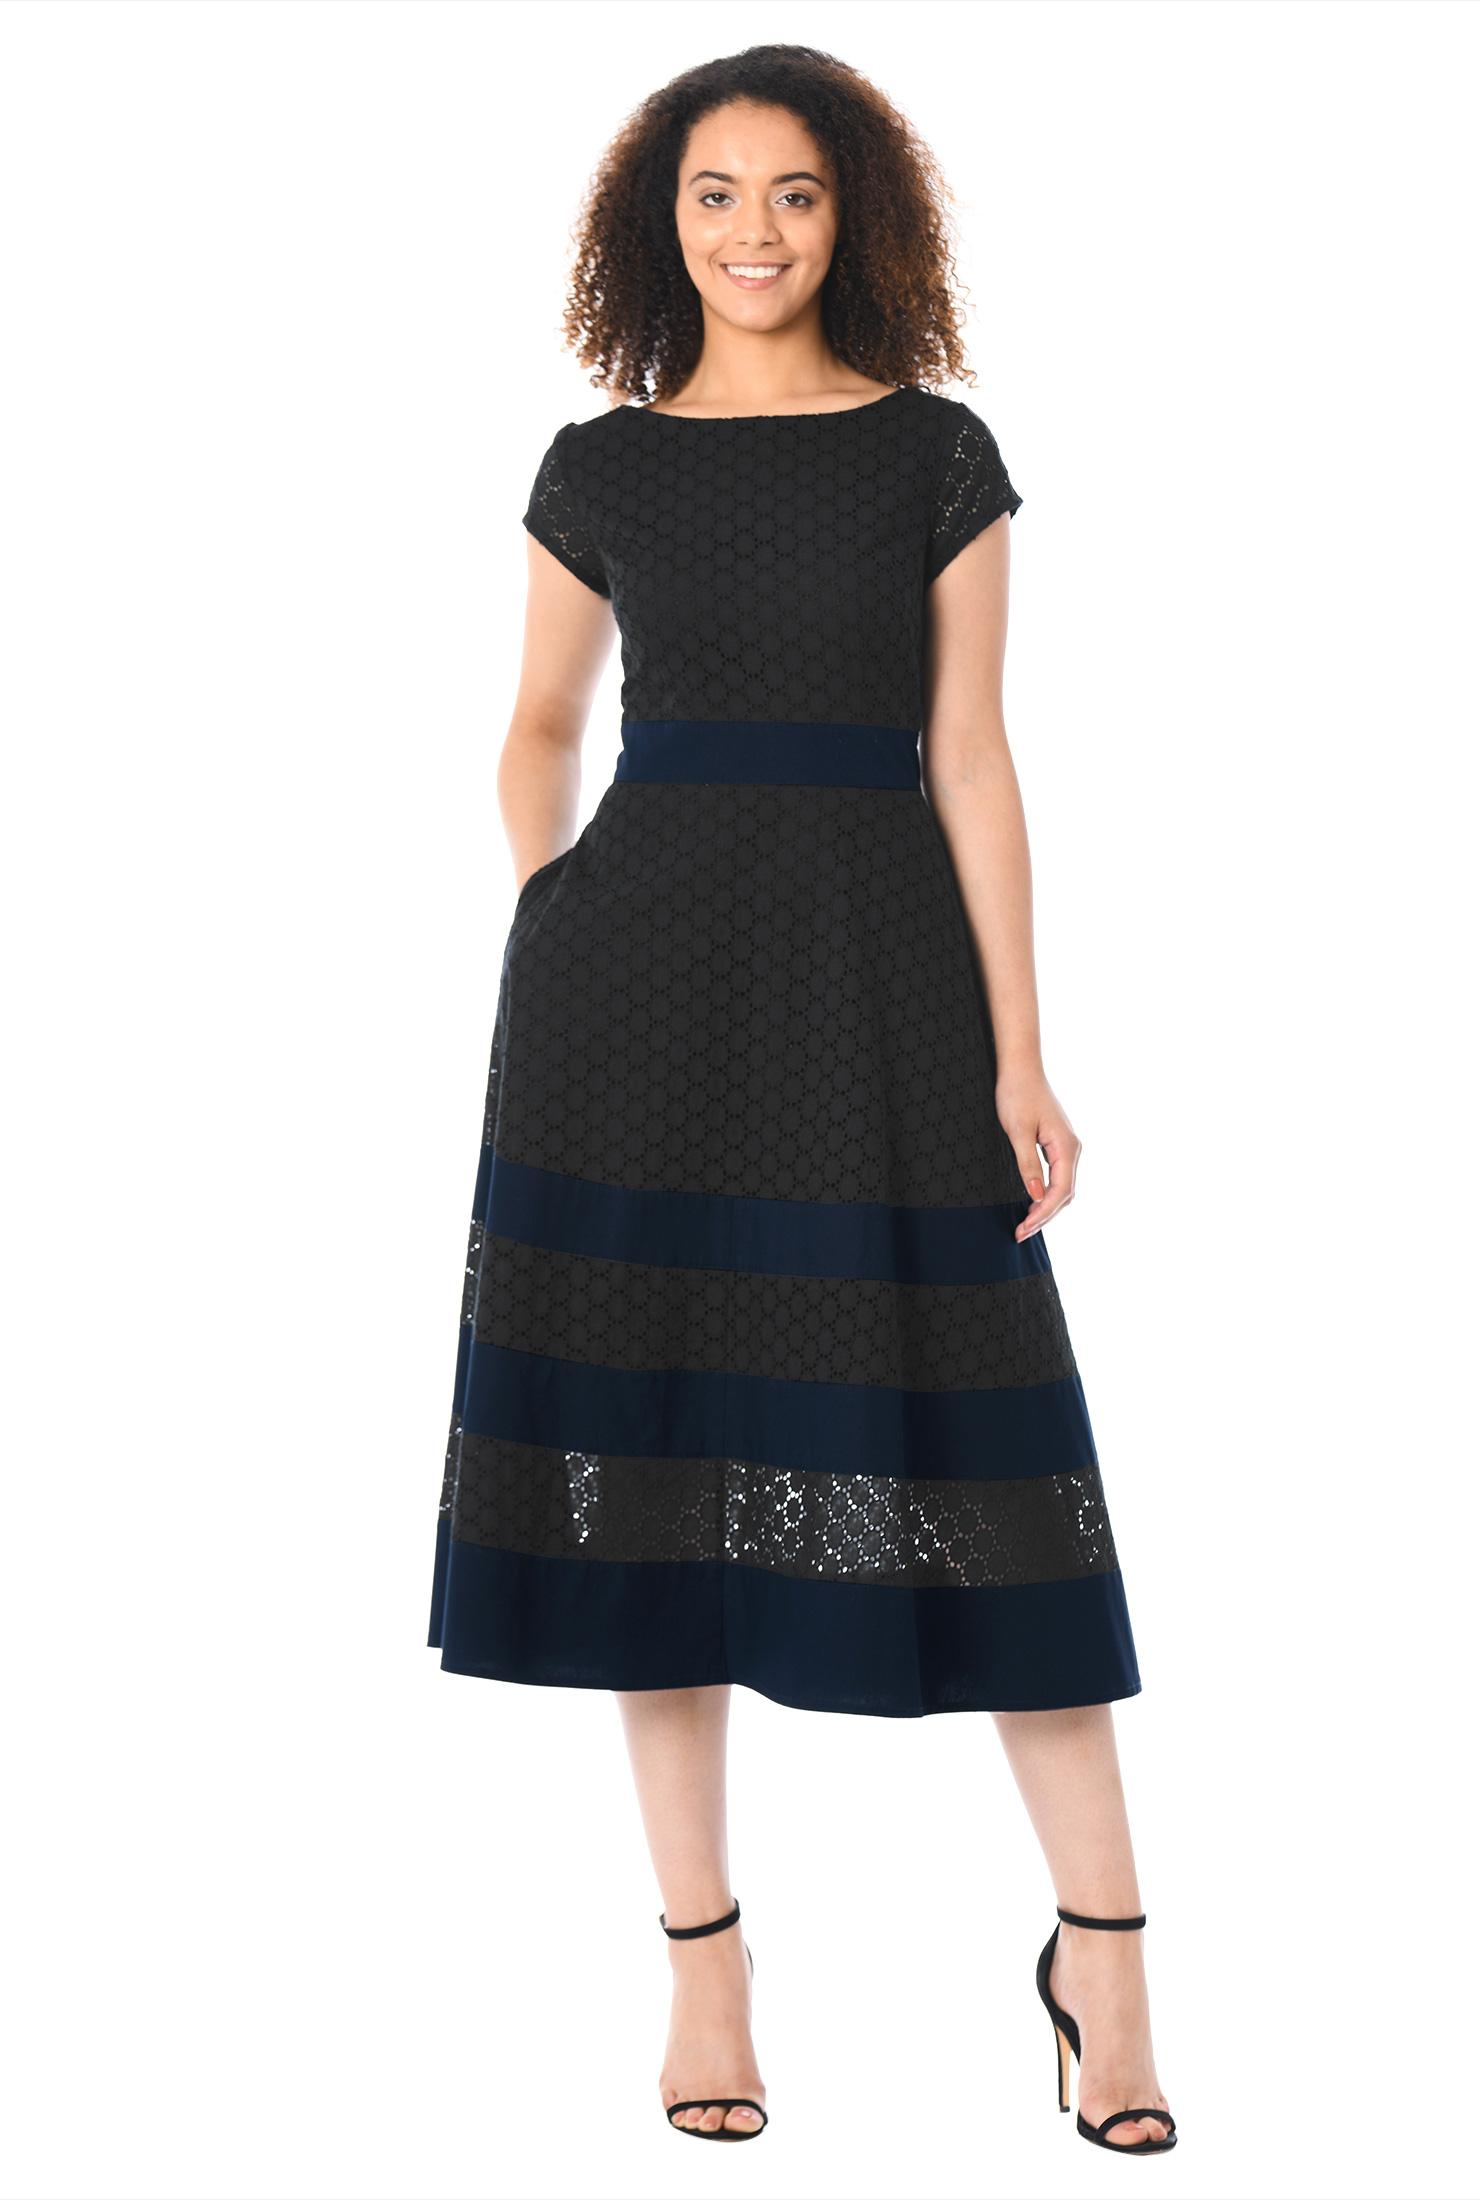 a74ce8e86e2 Women s Fashion Clothing 0-36W and Custom